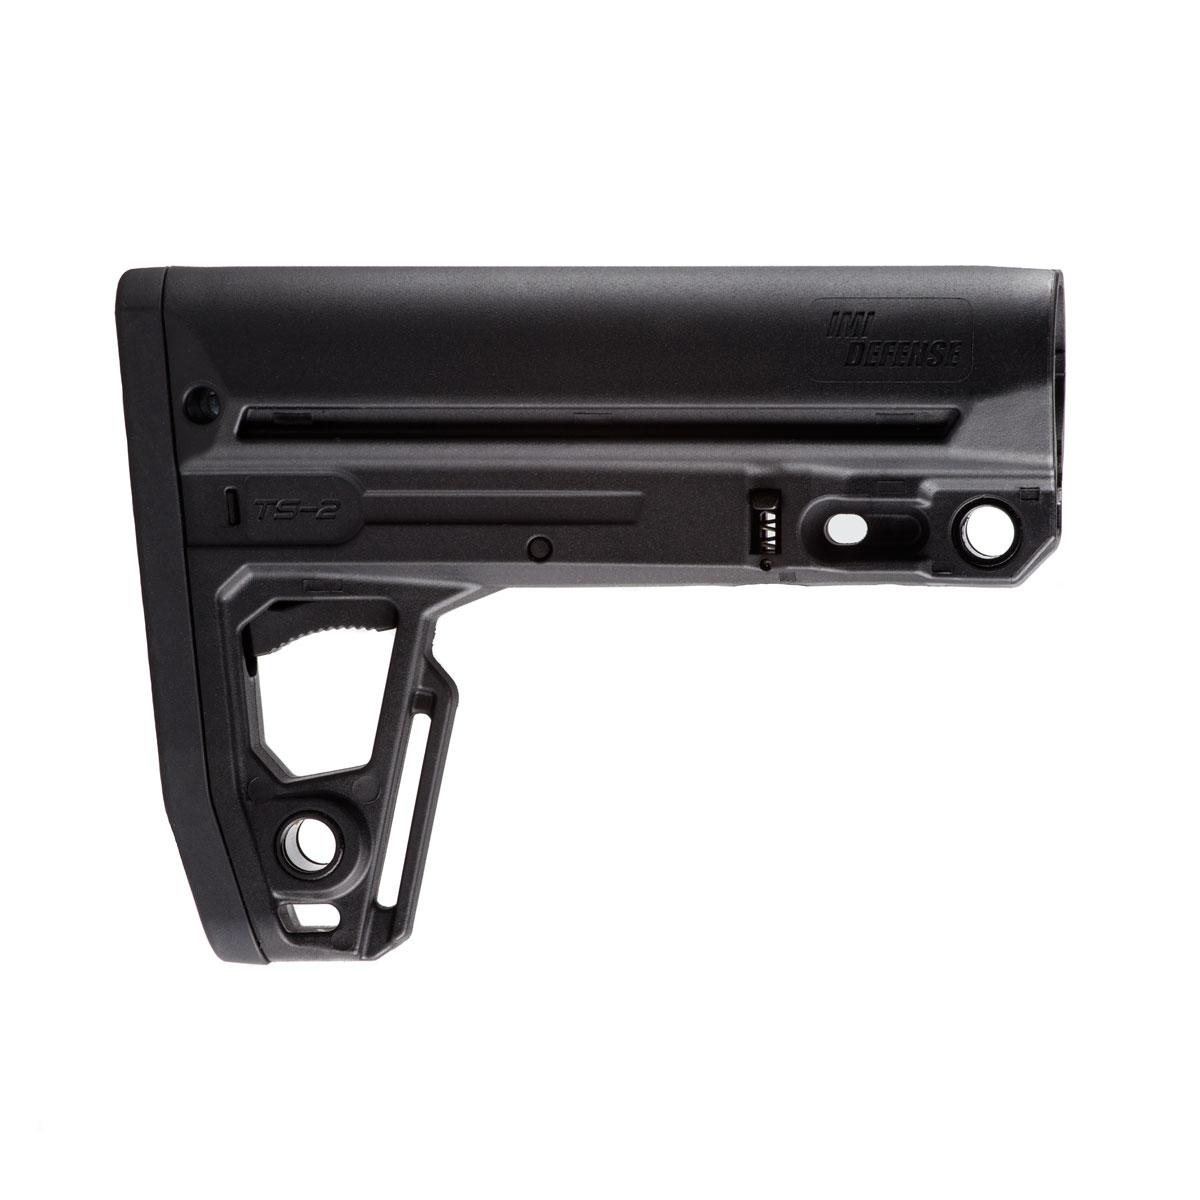 TS2 Tactical stock M16/AR15